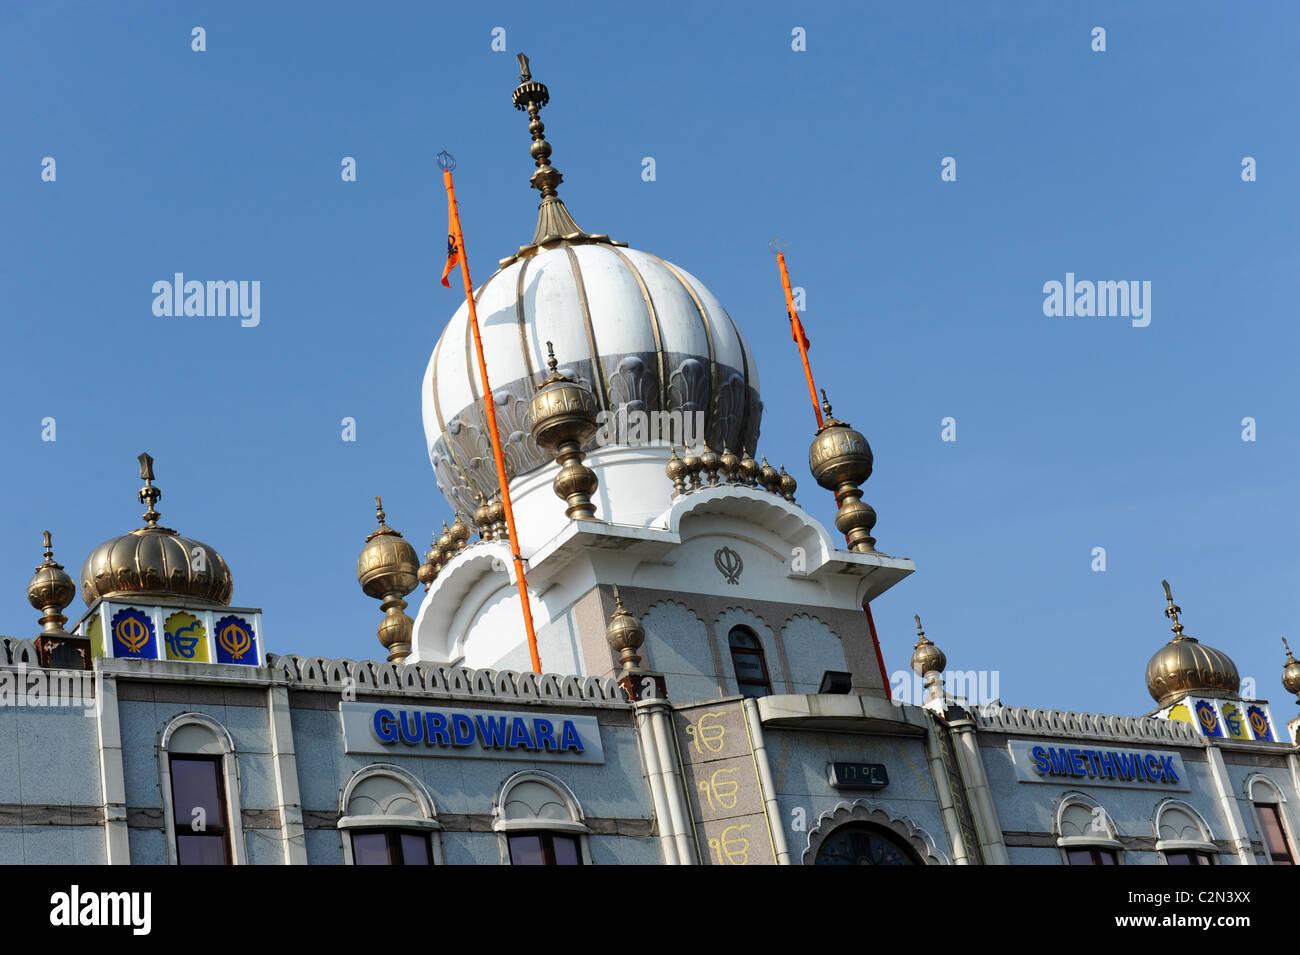 Guru Nanak Gurdwara Sikh temple in Smethwick near Birmingham UK. - Stock Image